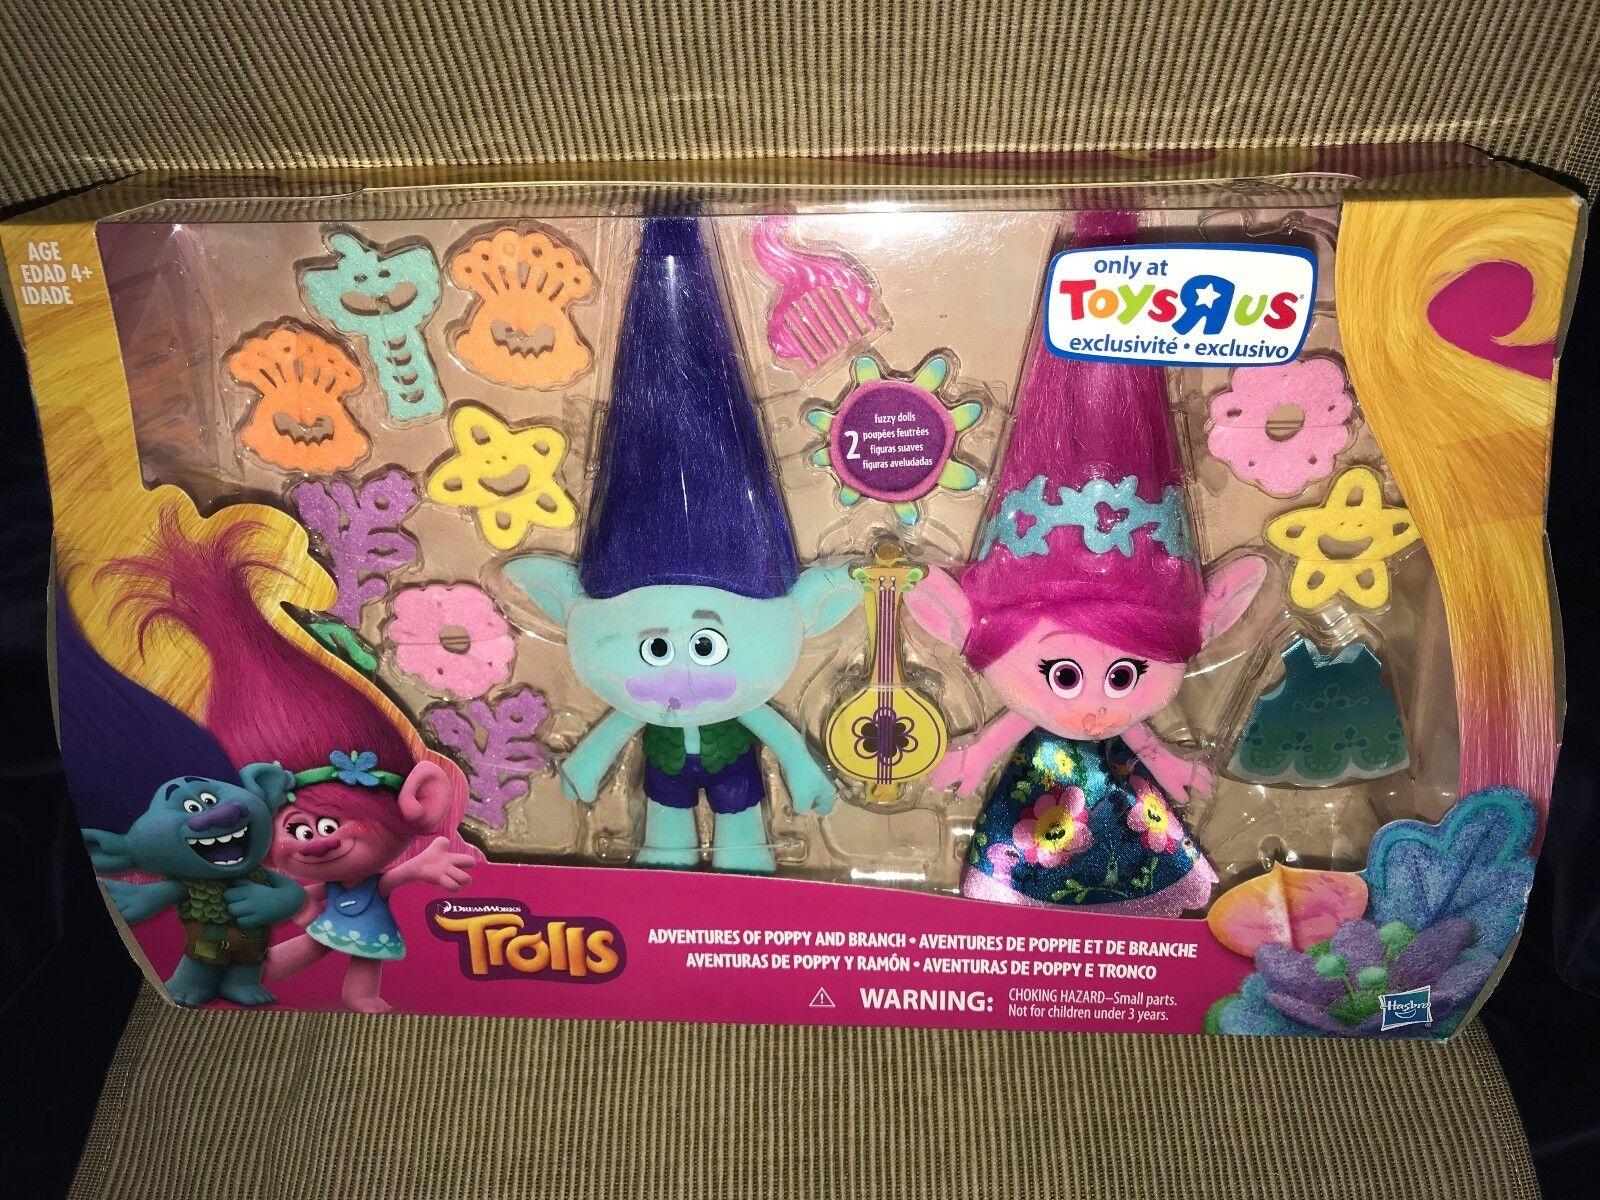 New 2017 2017 2017 Toys R Us Exc Dreamworks Trolls Adventures Of Poppy & Branch Dolls Acc 418bf5